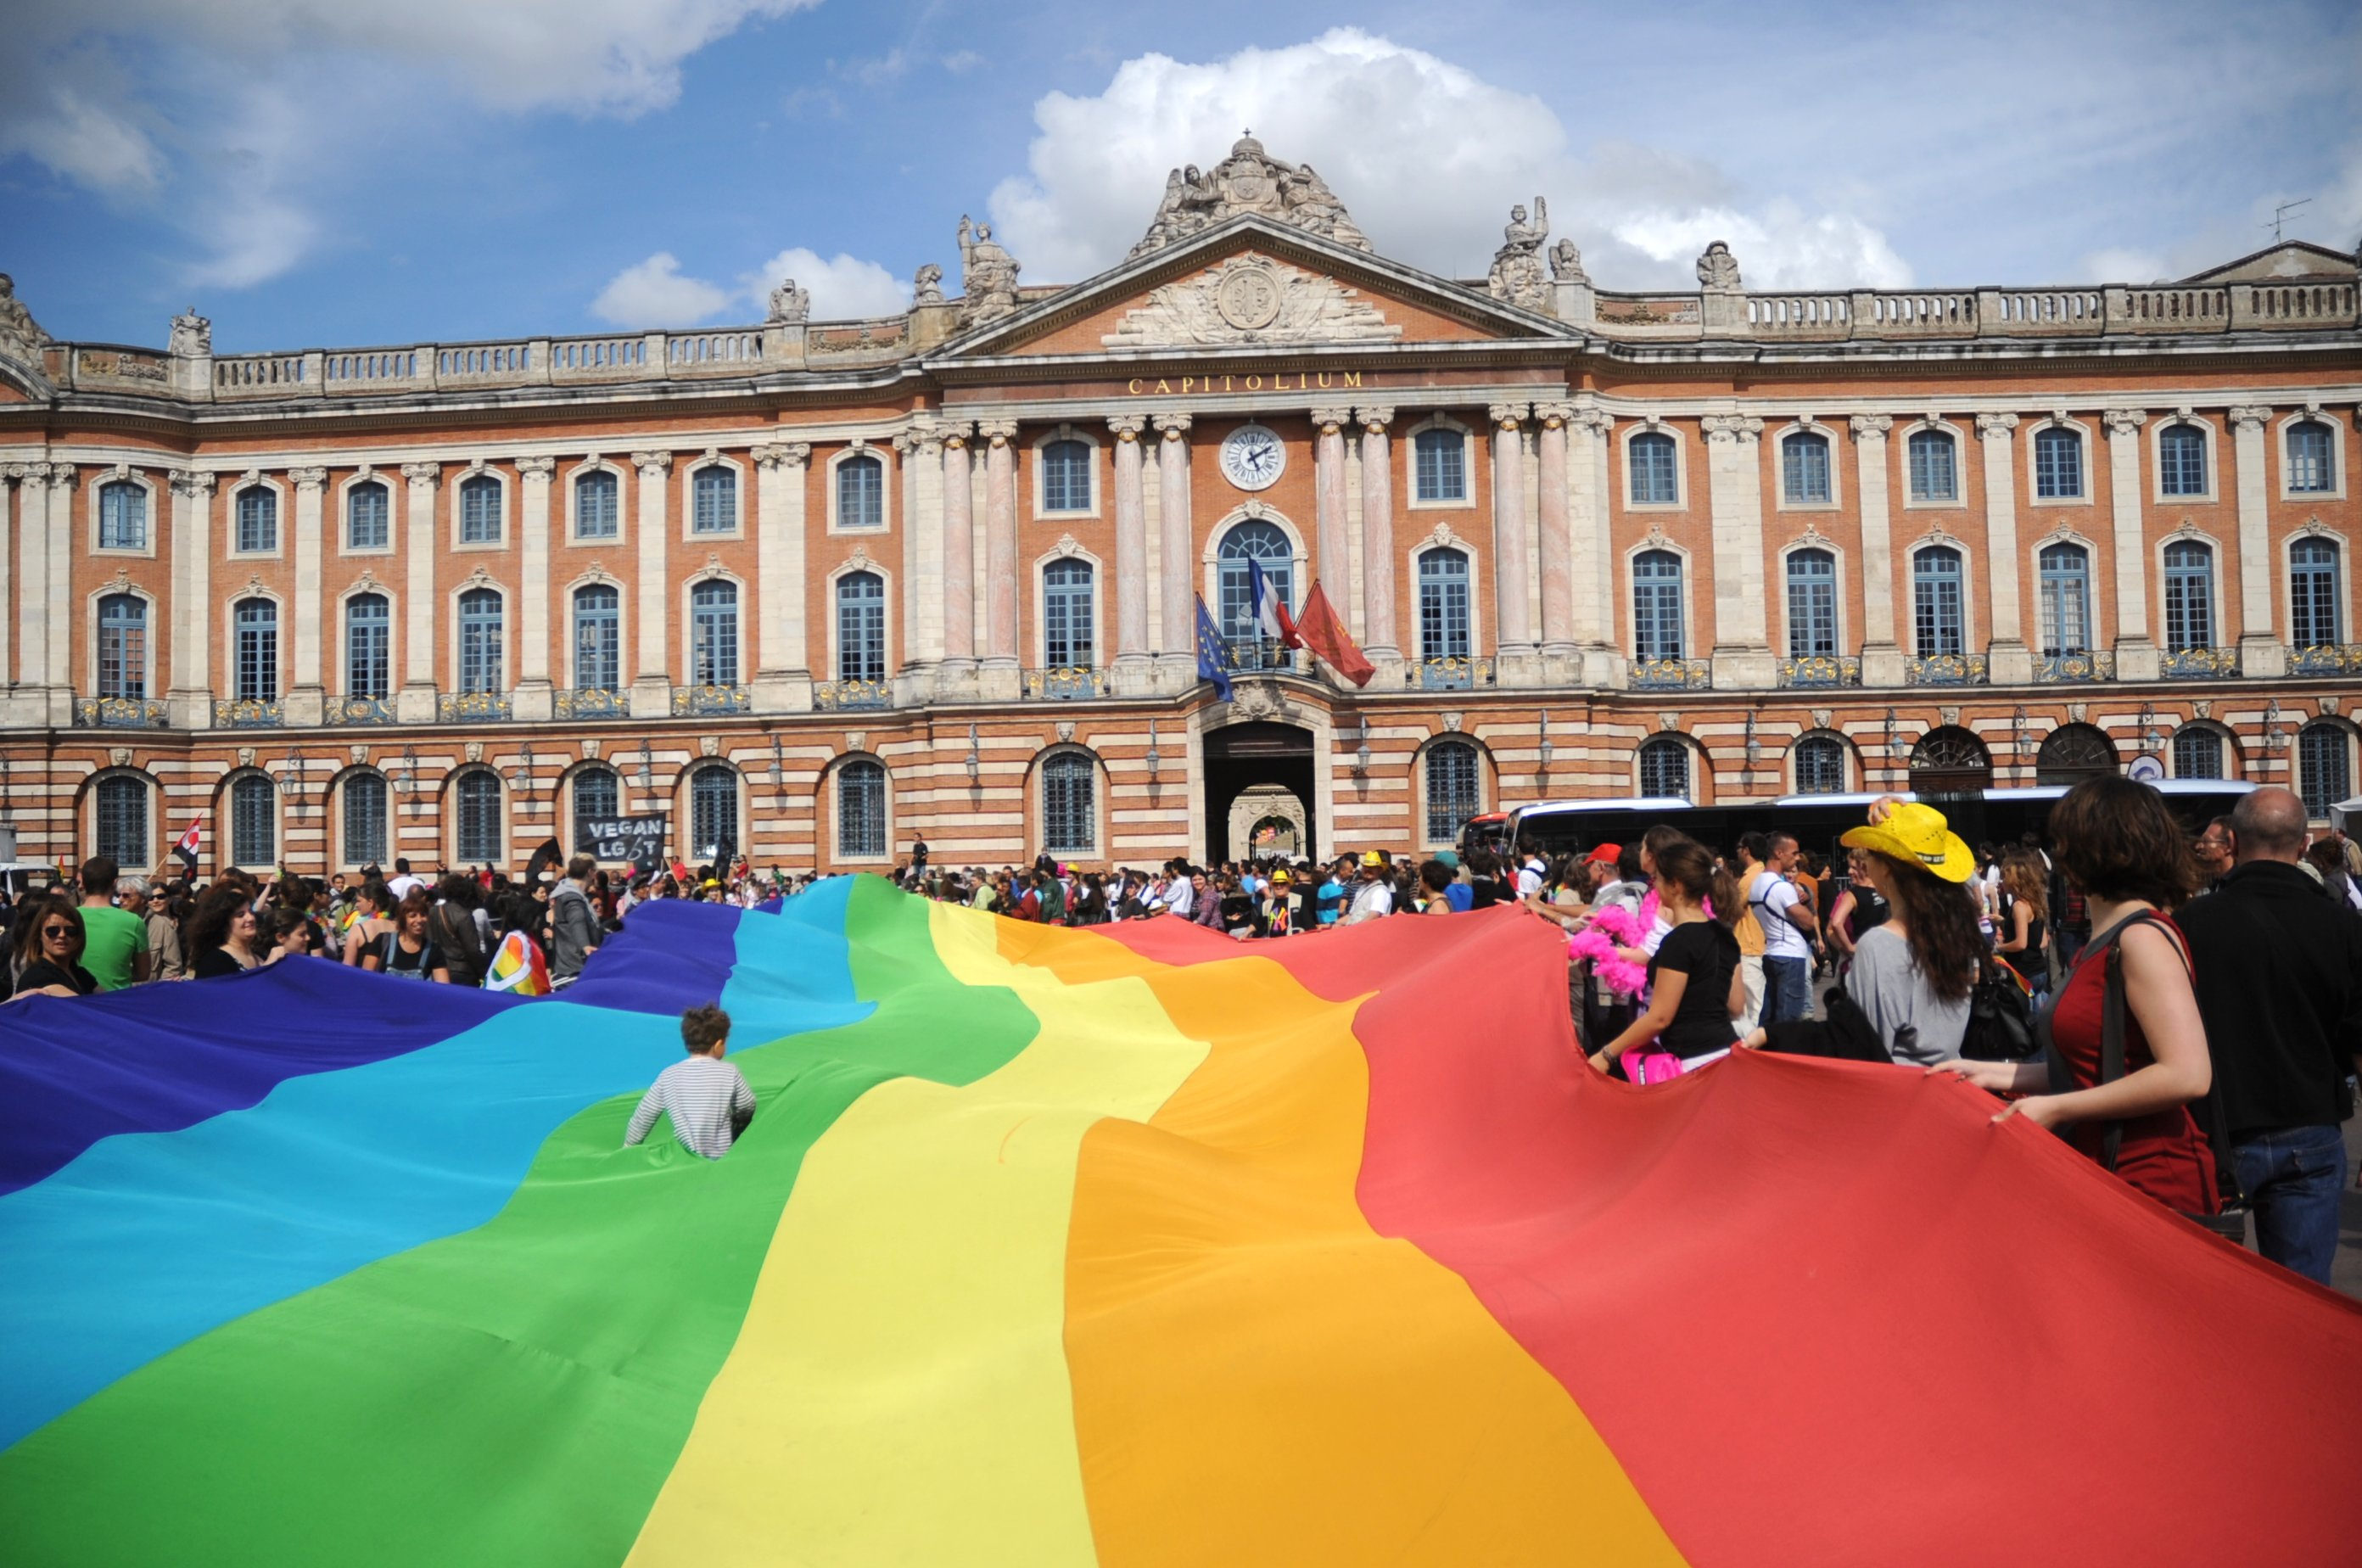 mariage gay, famille homoparentale, adoption, société.